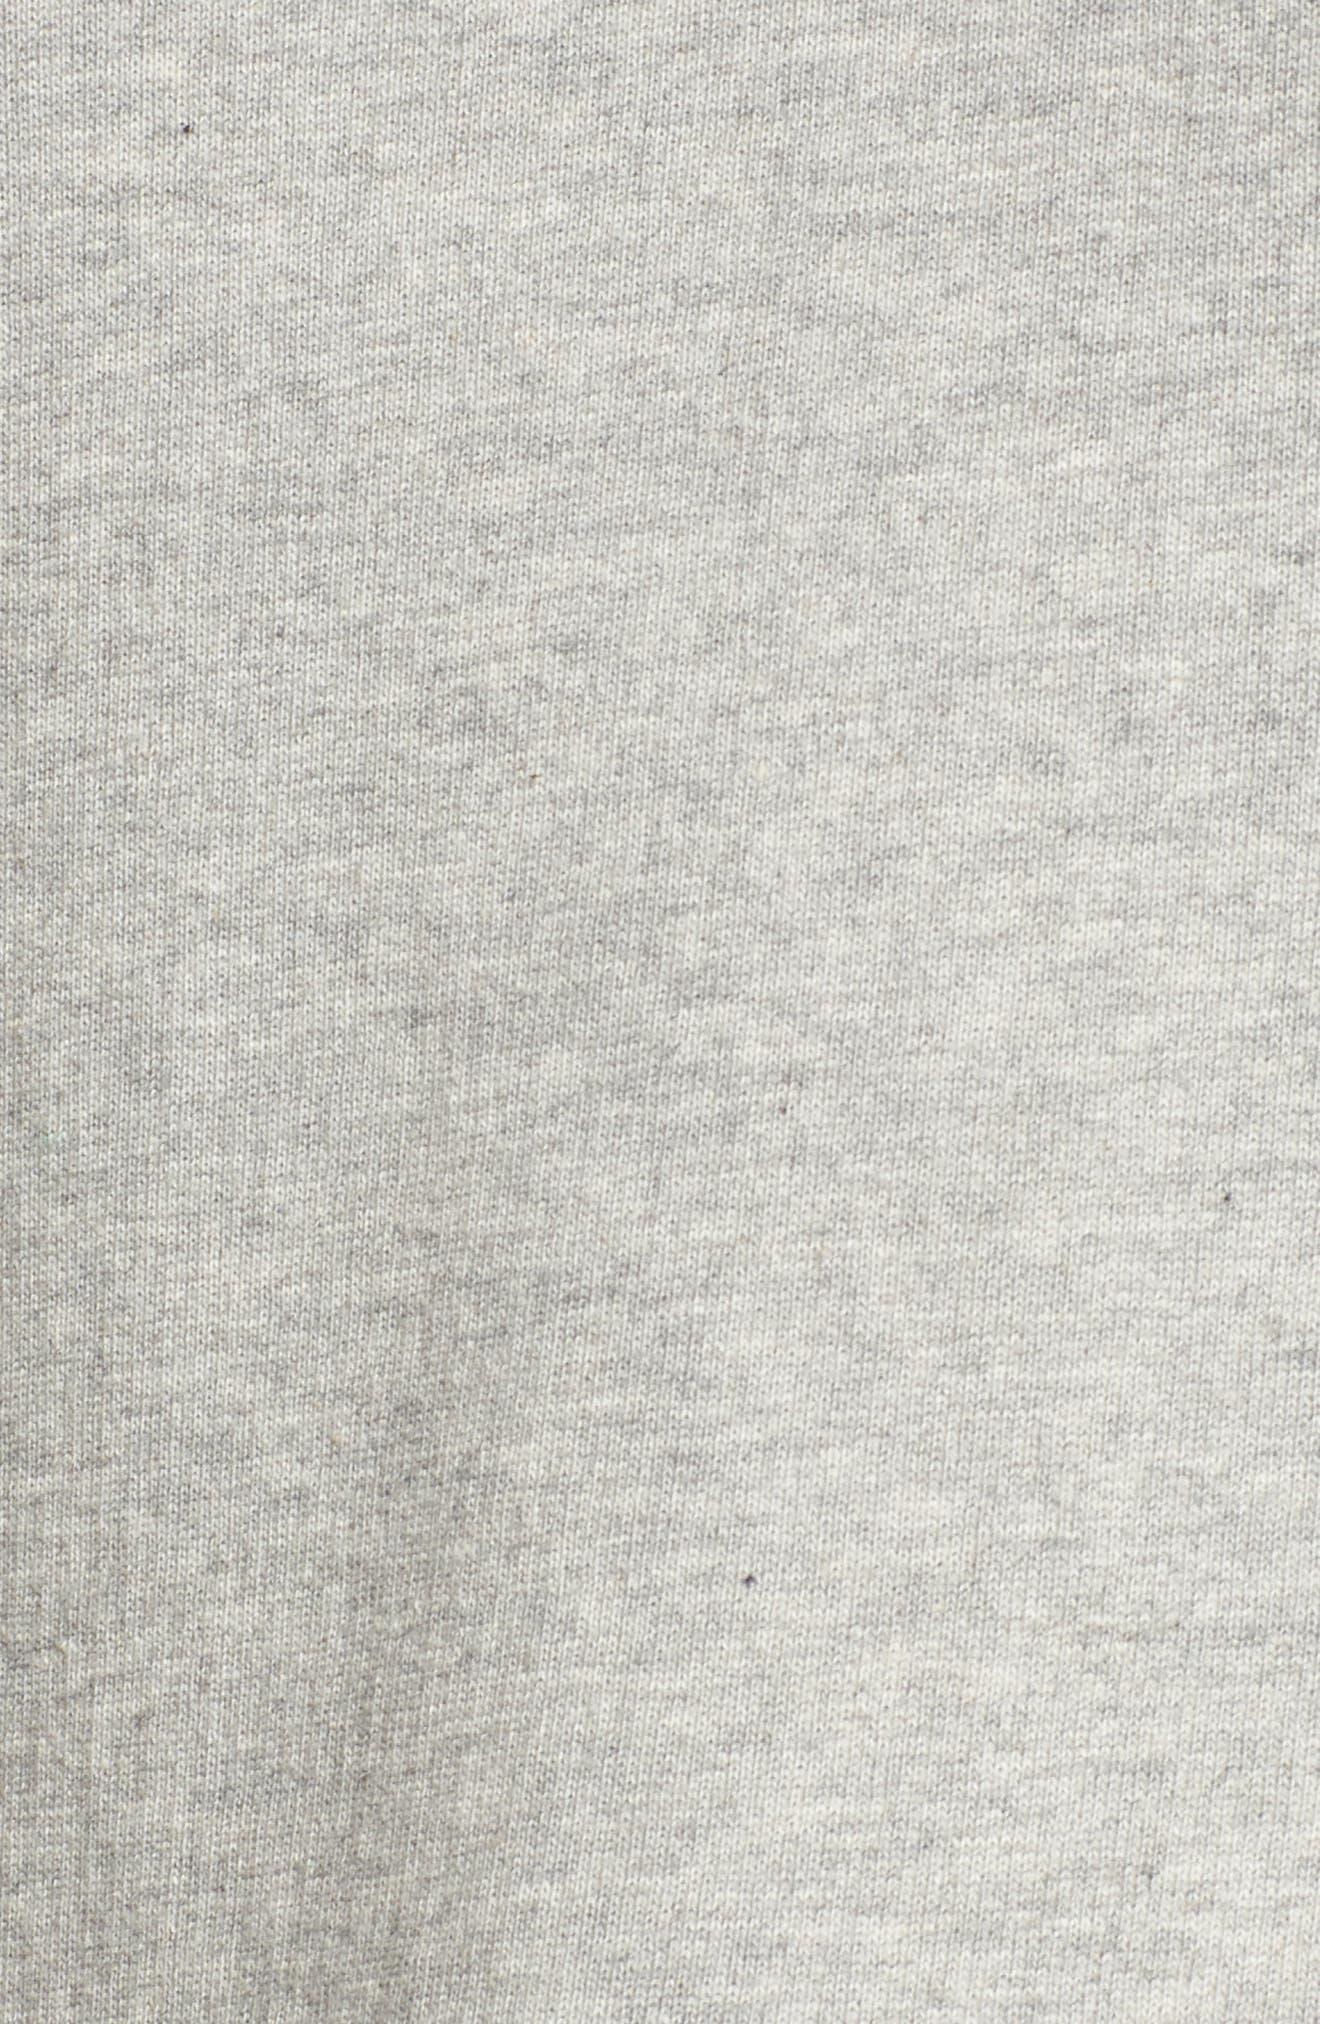 Ruffle Trim Sweatshirt,                             Alternate thumbnail 5, color,                             030